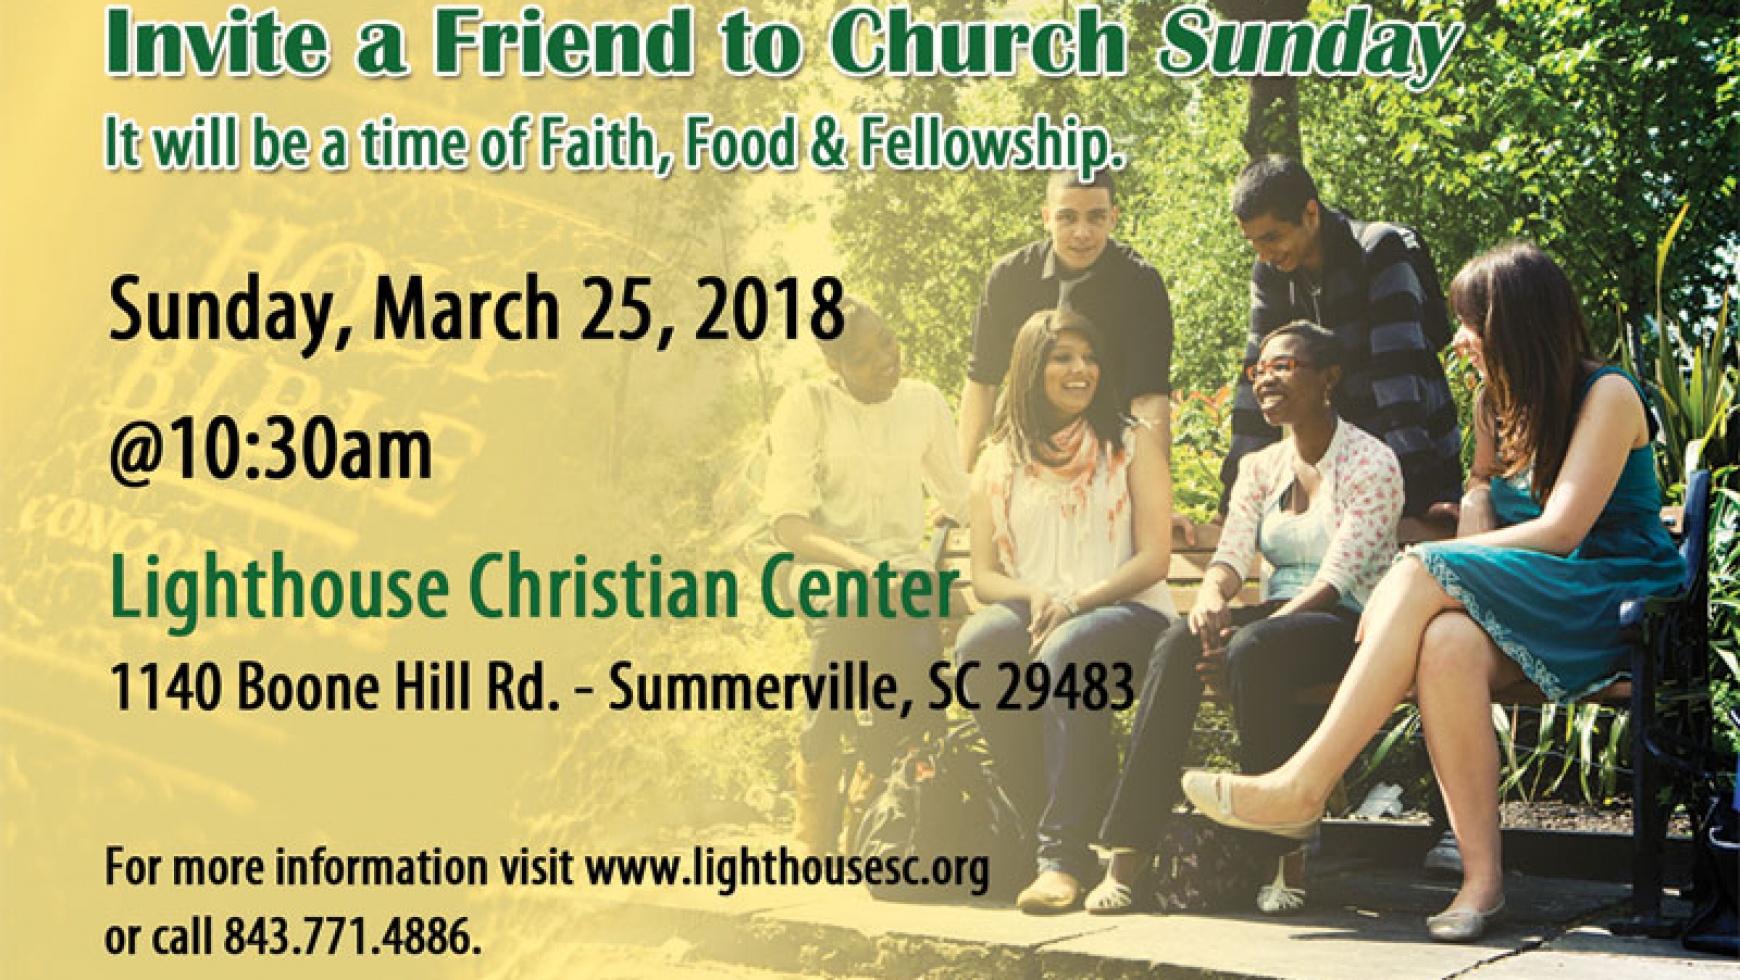 Invite a Friend to Church Sunday